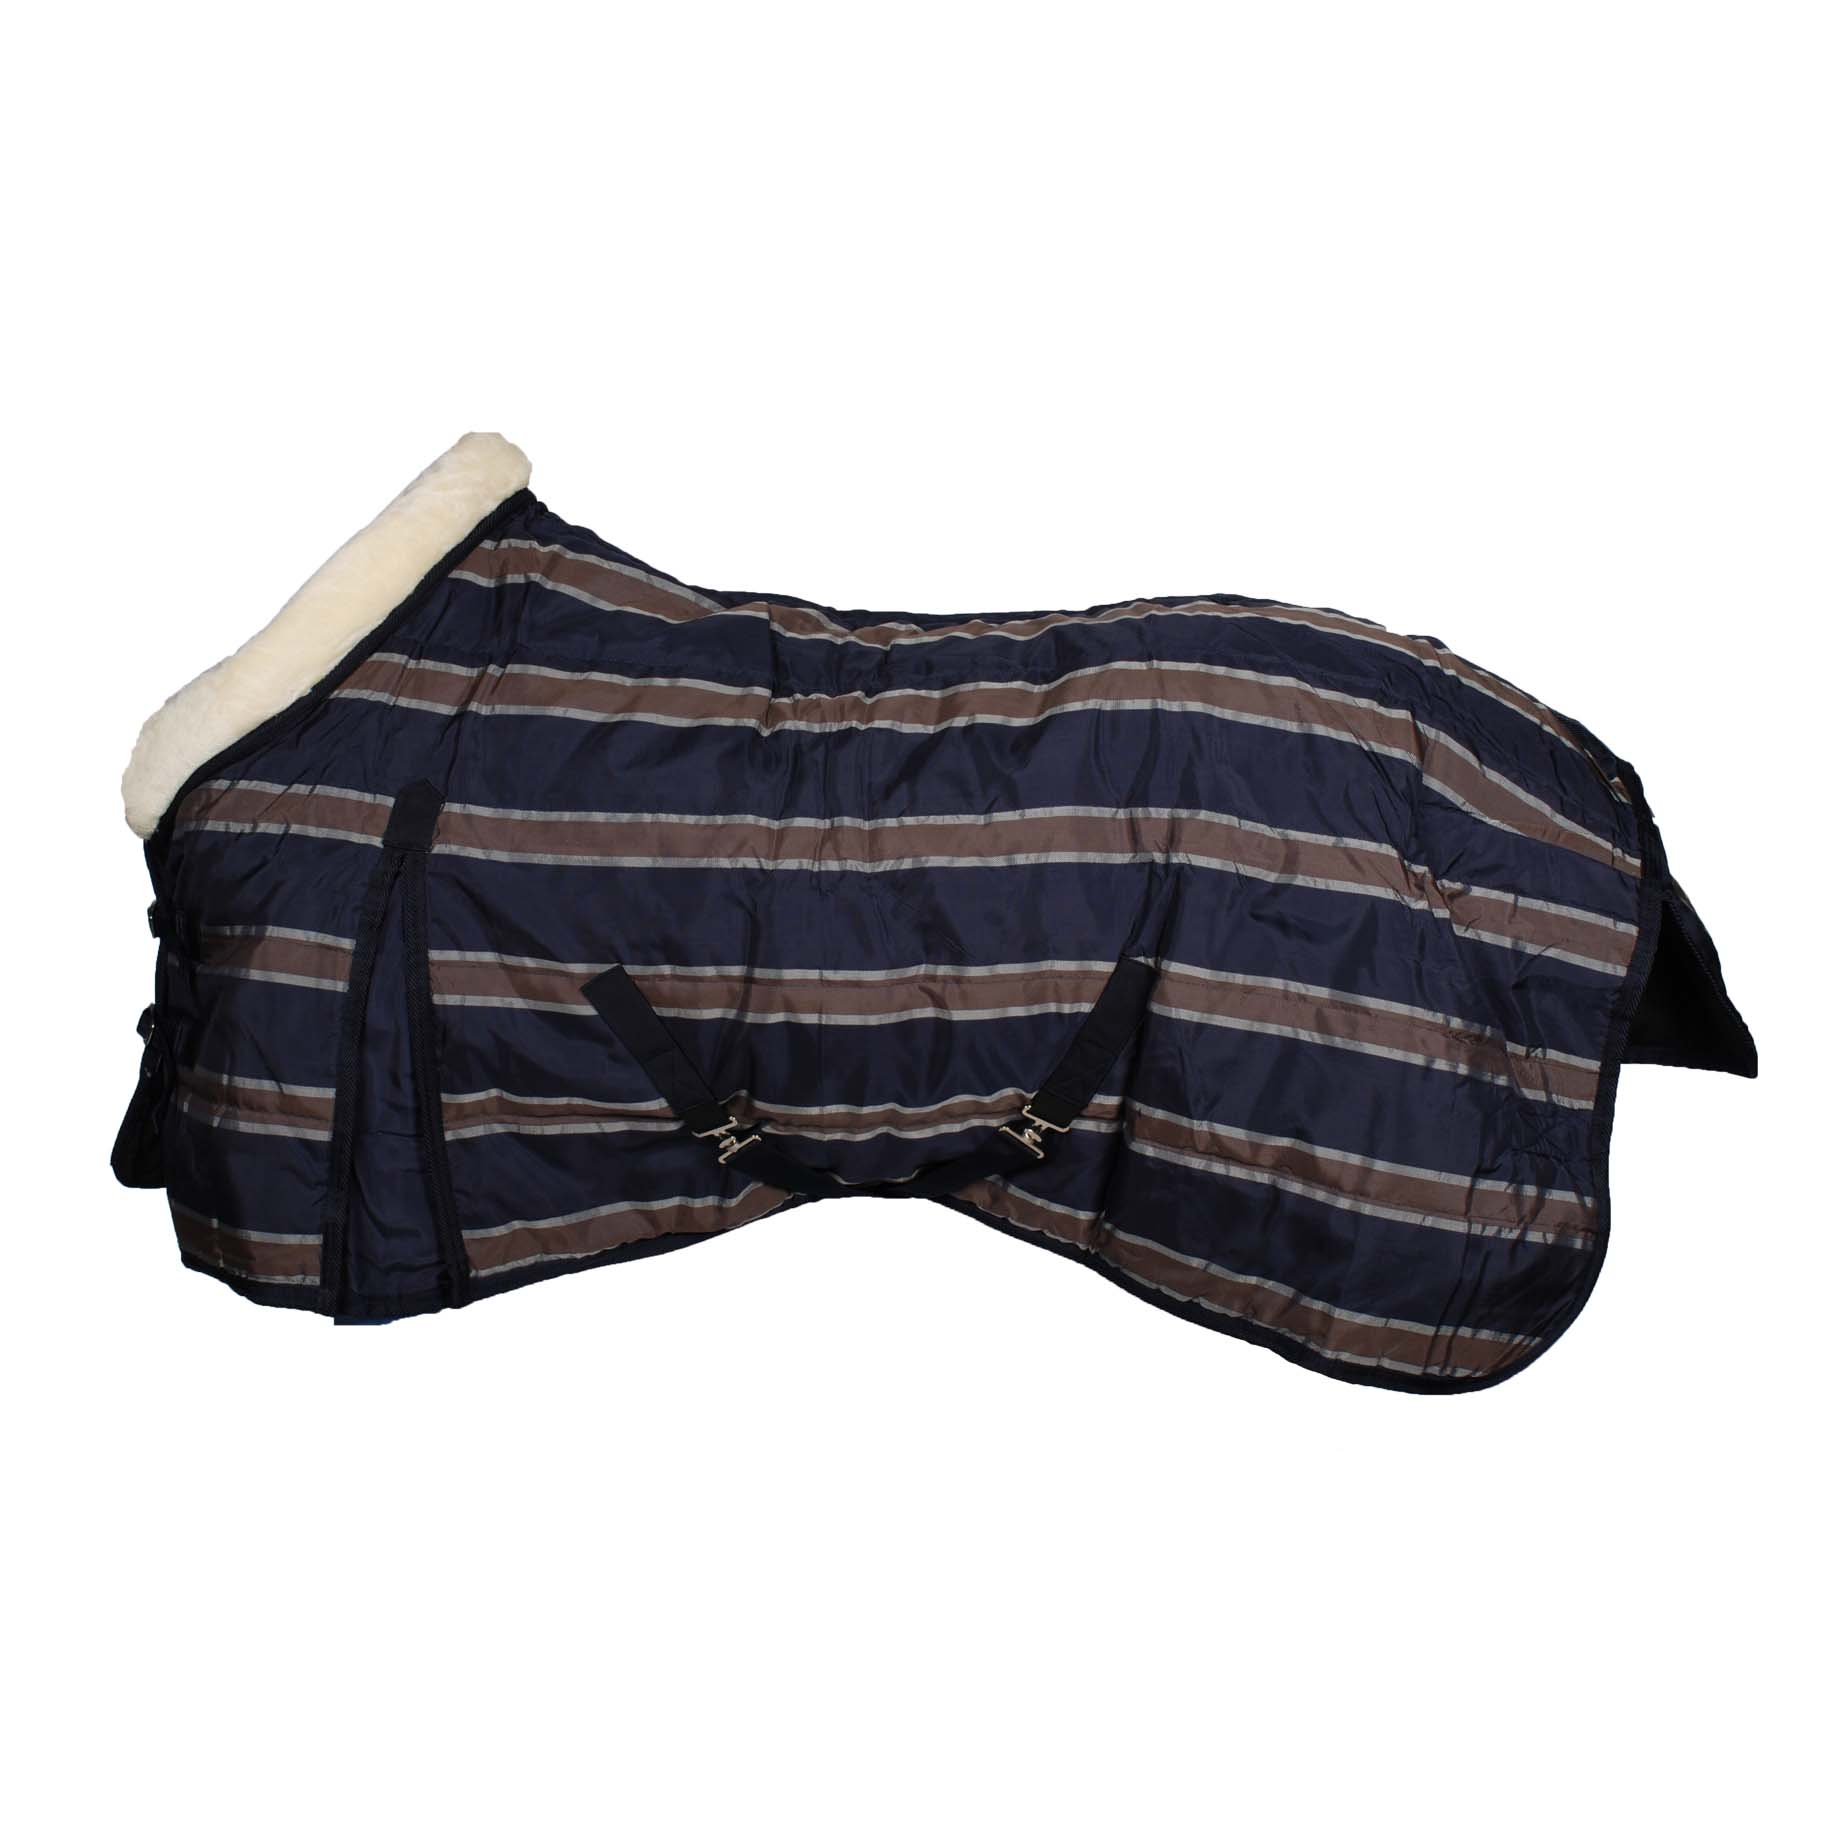 Pagony Stripe 220 staldeken donkerblauw maat:195